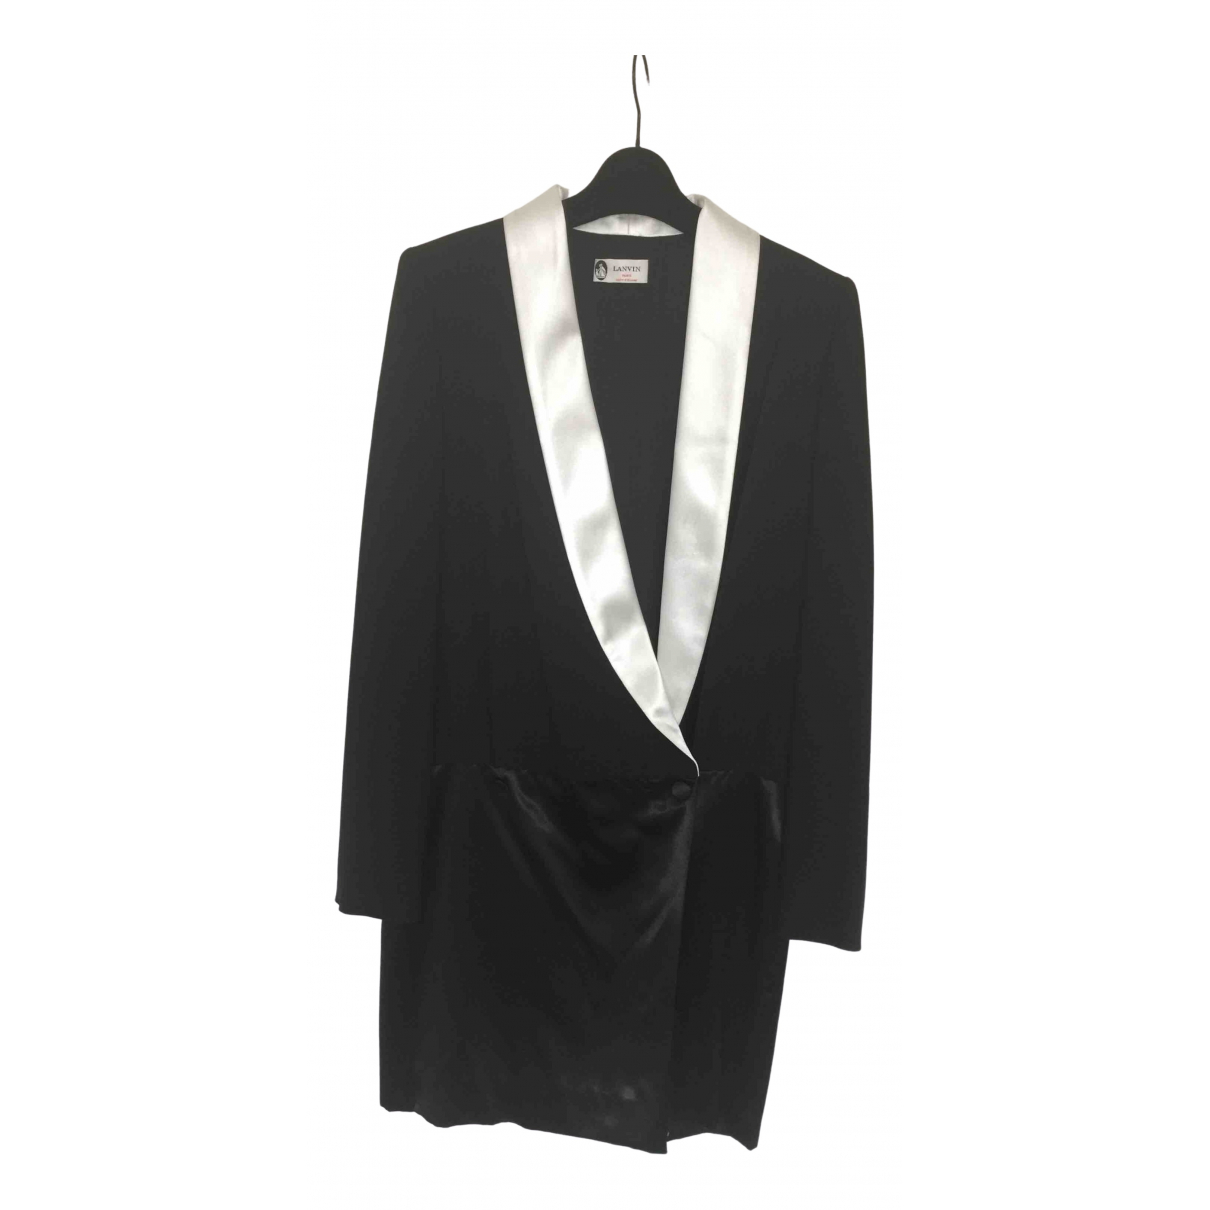 Lanvin \N Kleid in  Schwarz Viskose